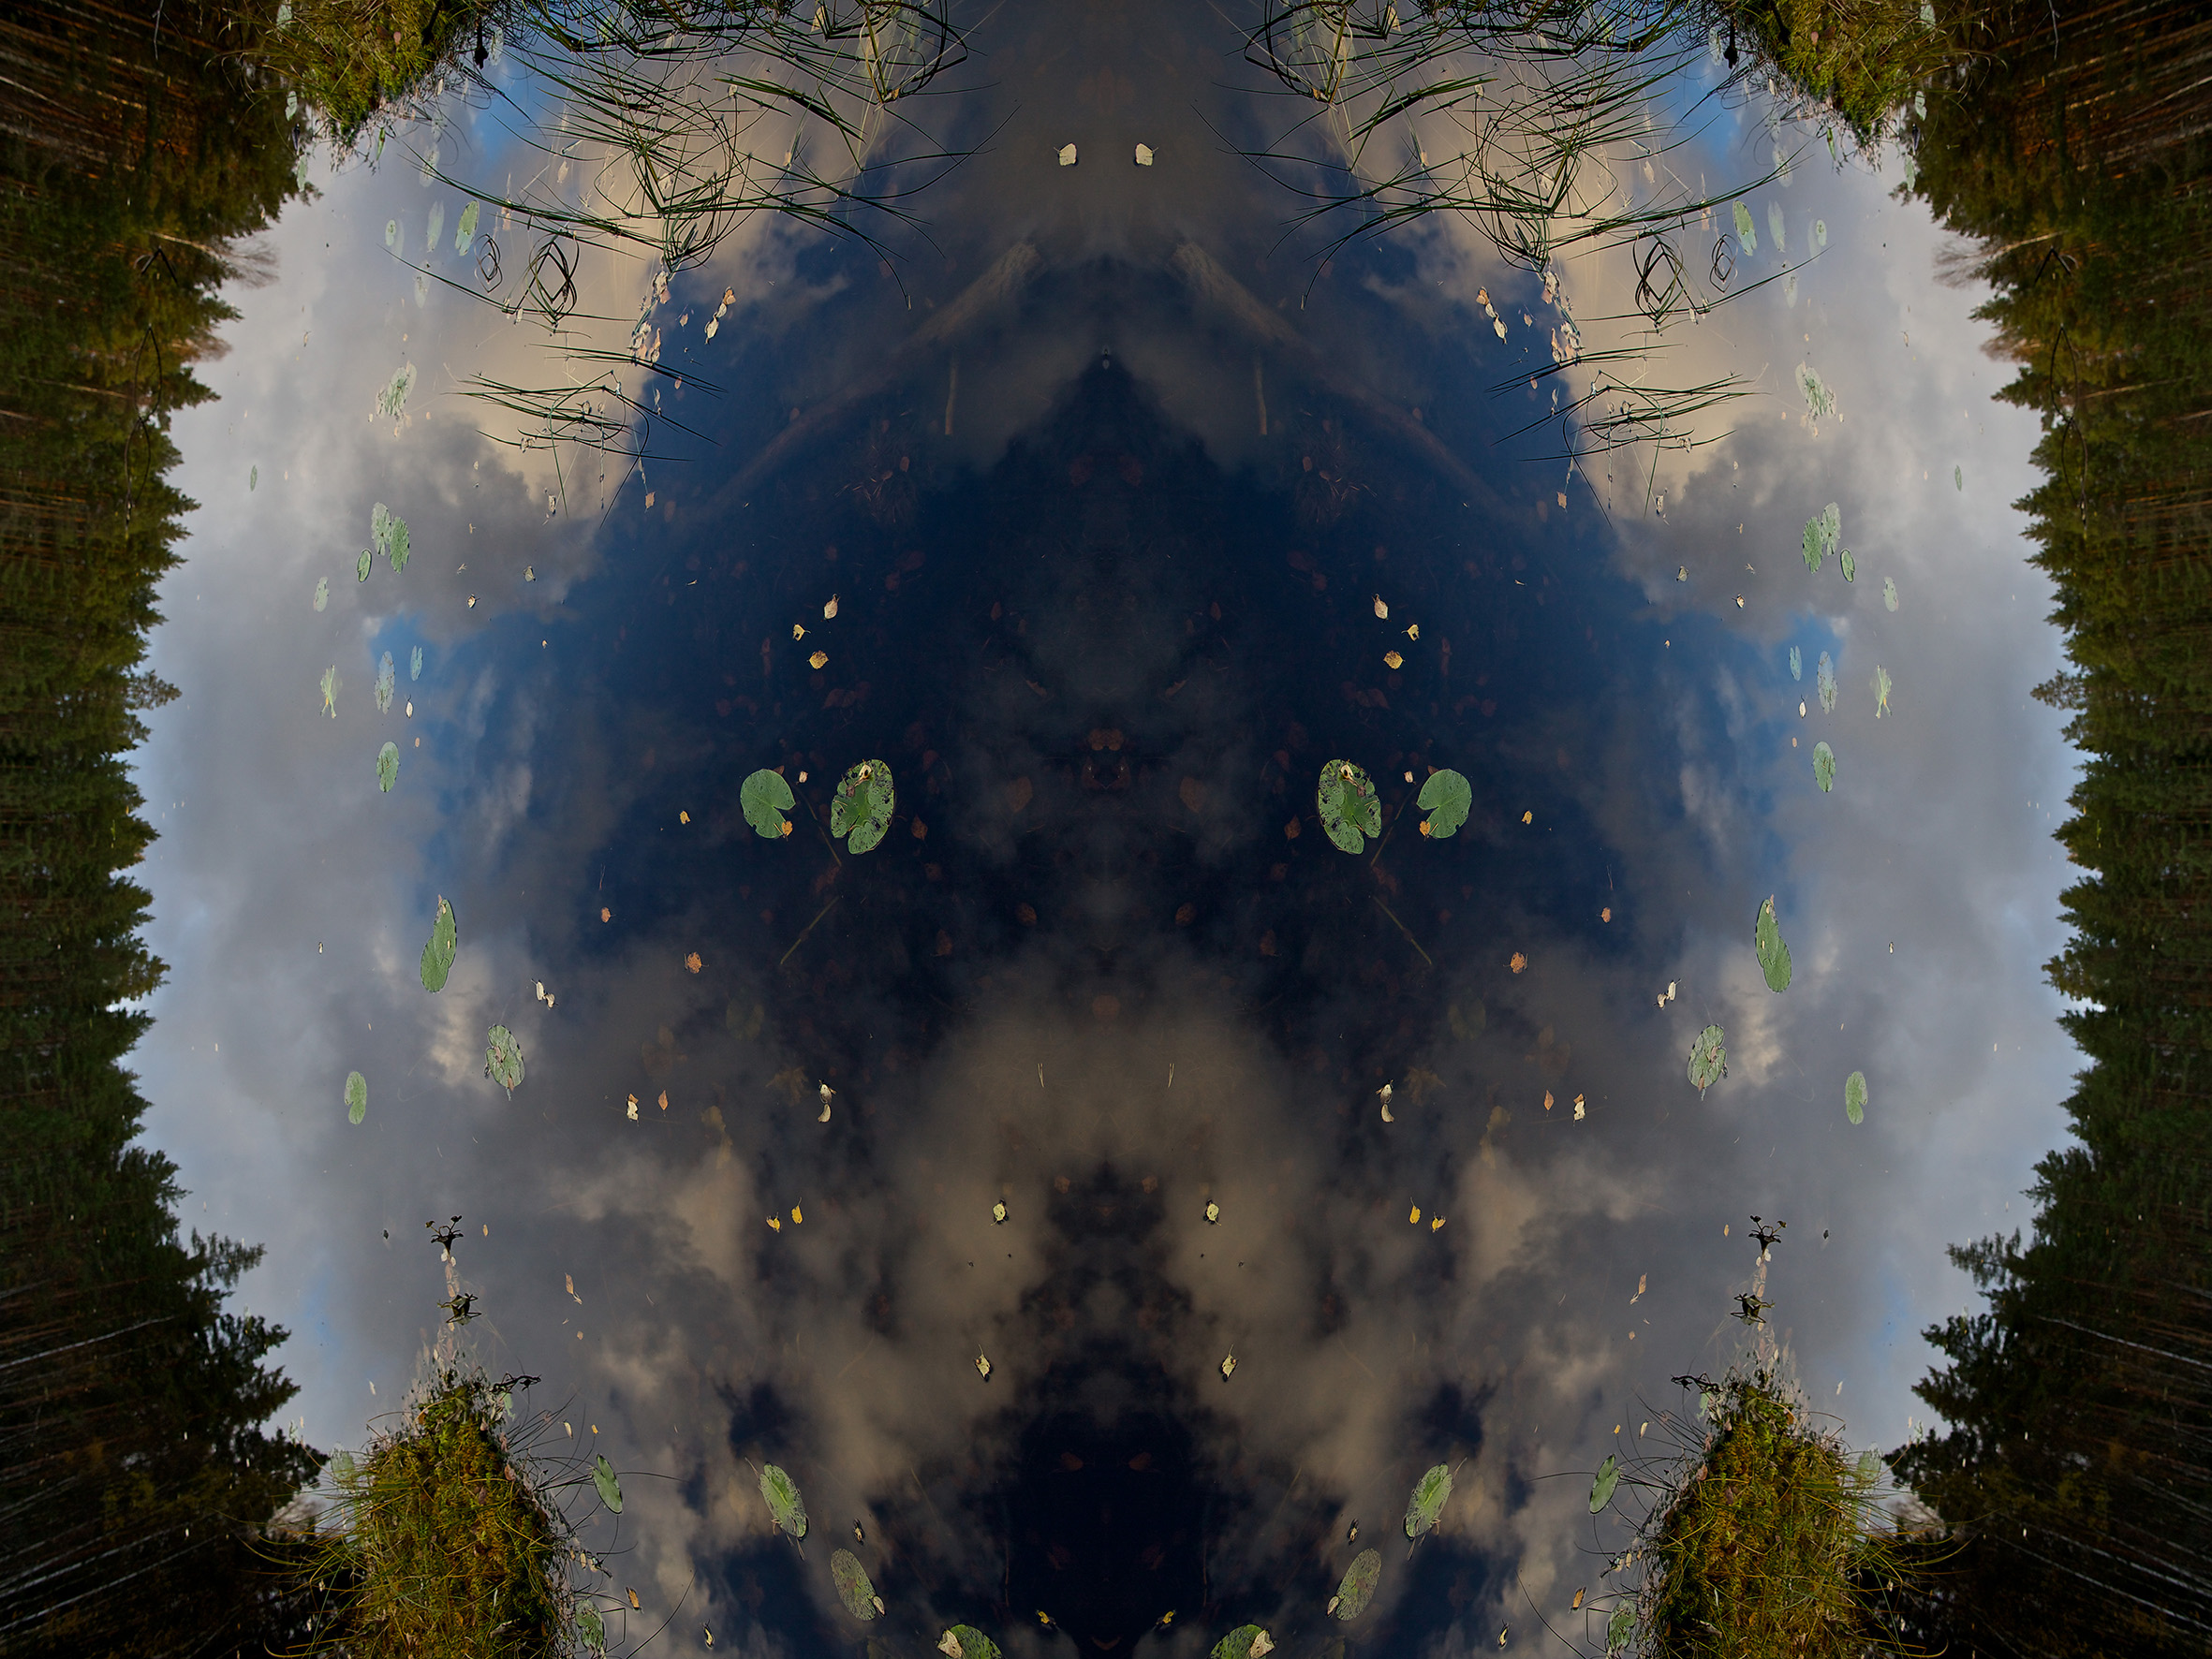 Mirror_Finland_Nuuksio_Peili5X.jpg